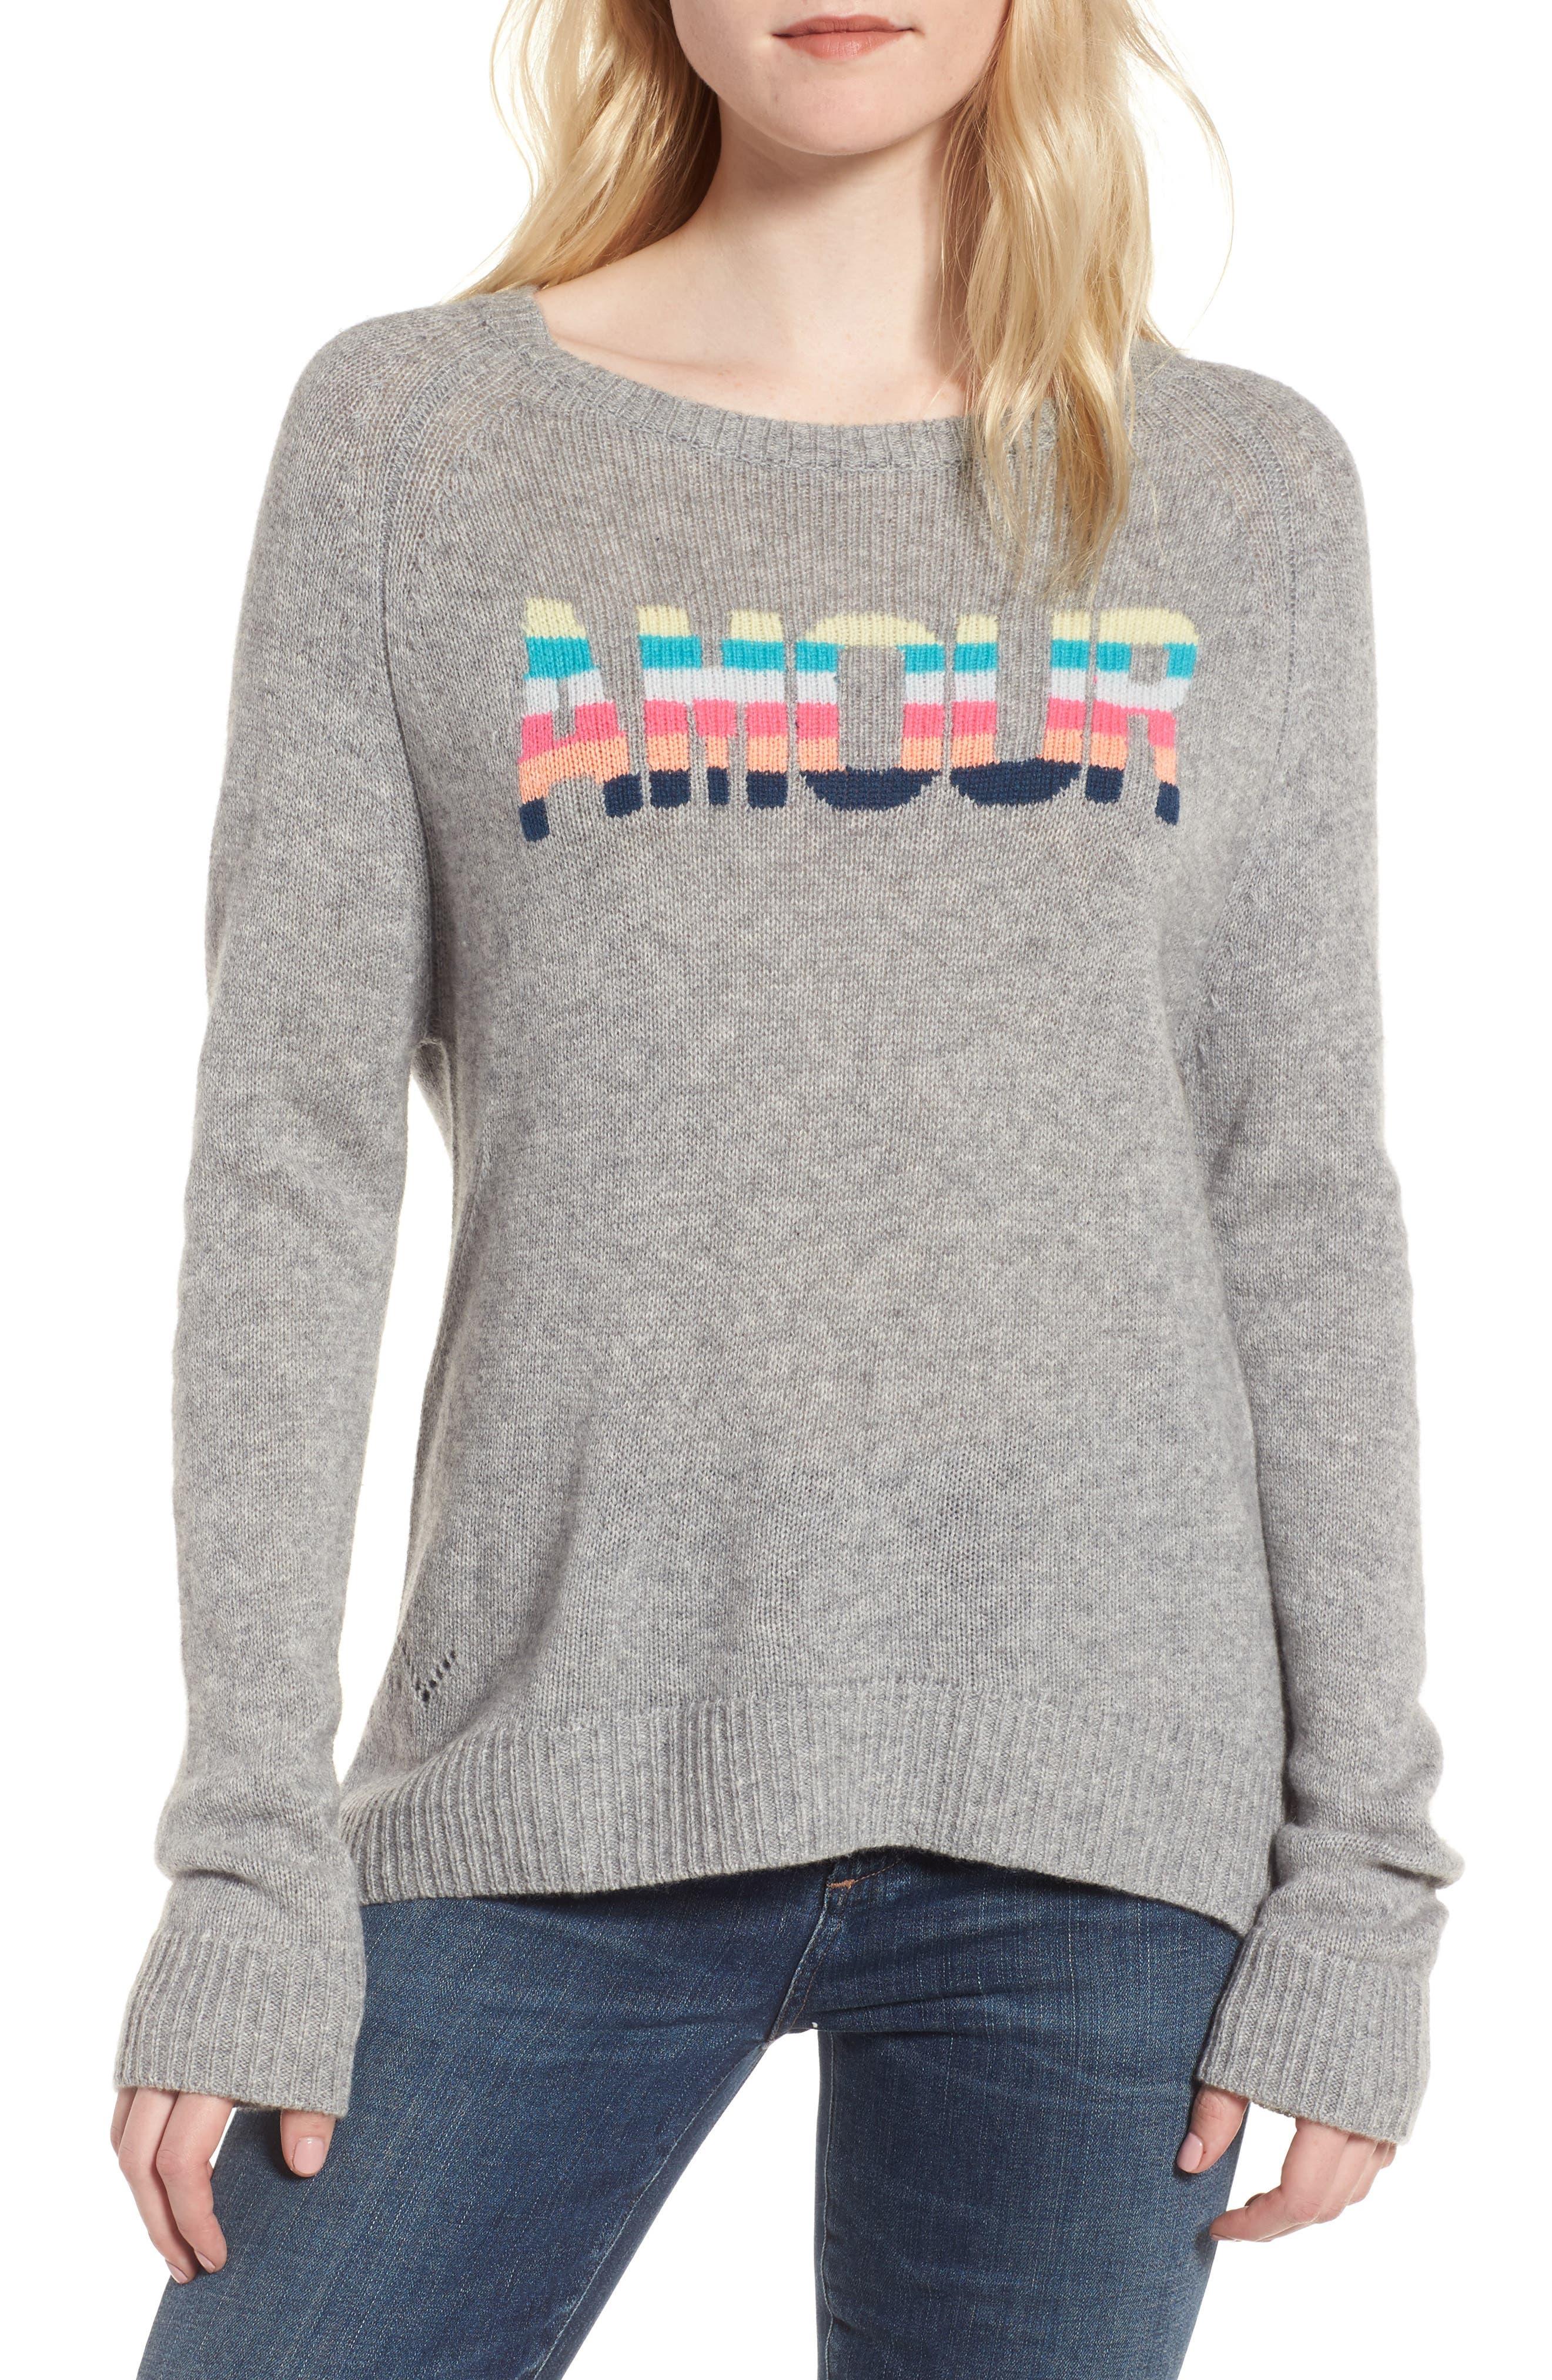 Zadig & Voltaire Baly Bis Cashmere Sweater